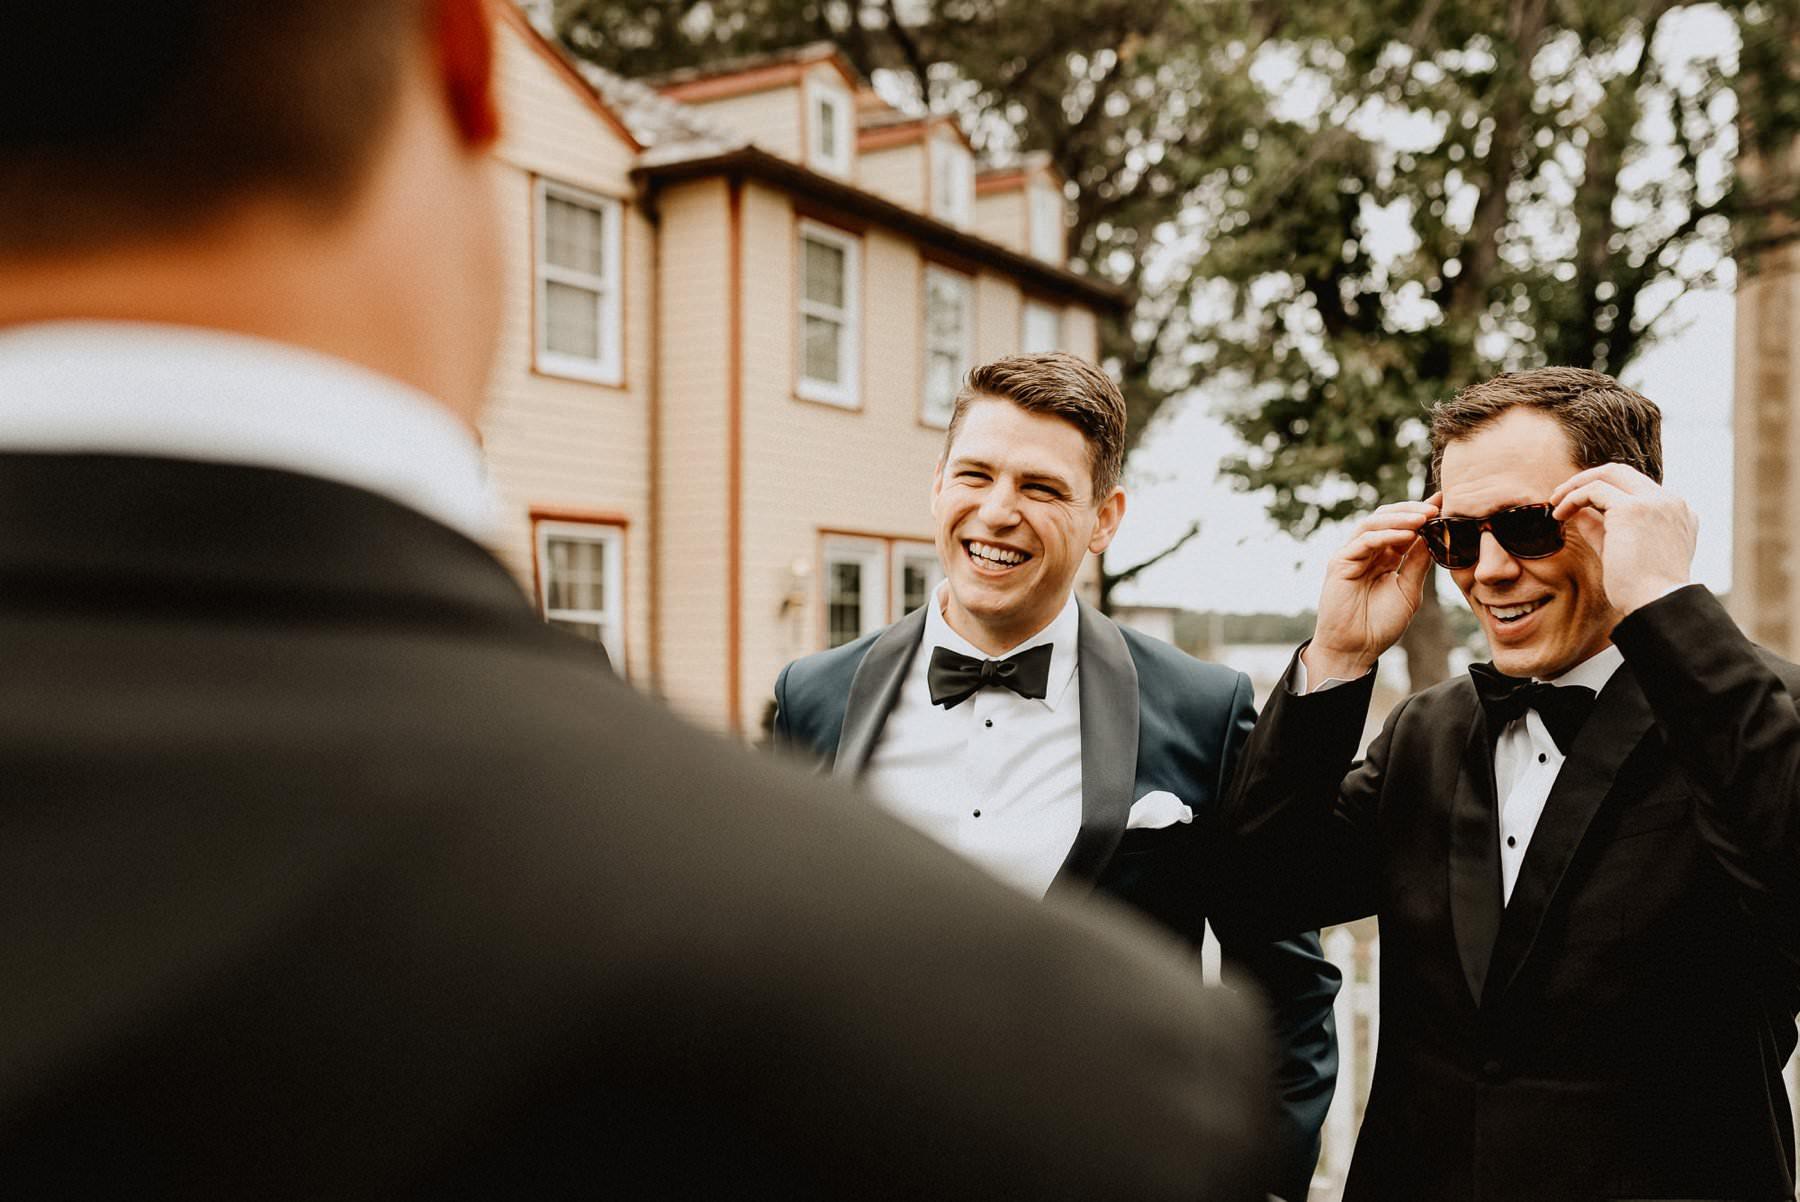 Philadelphia_private_estate_wedding-020.jpg